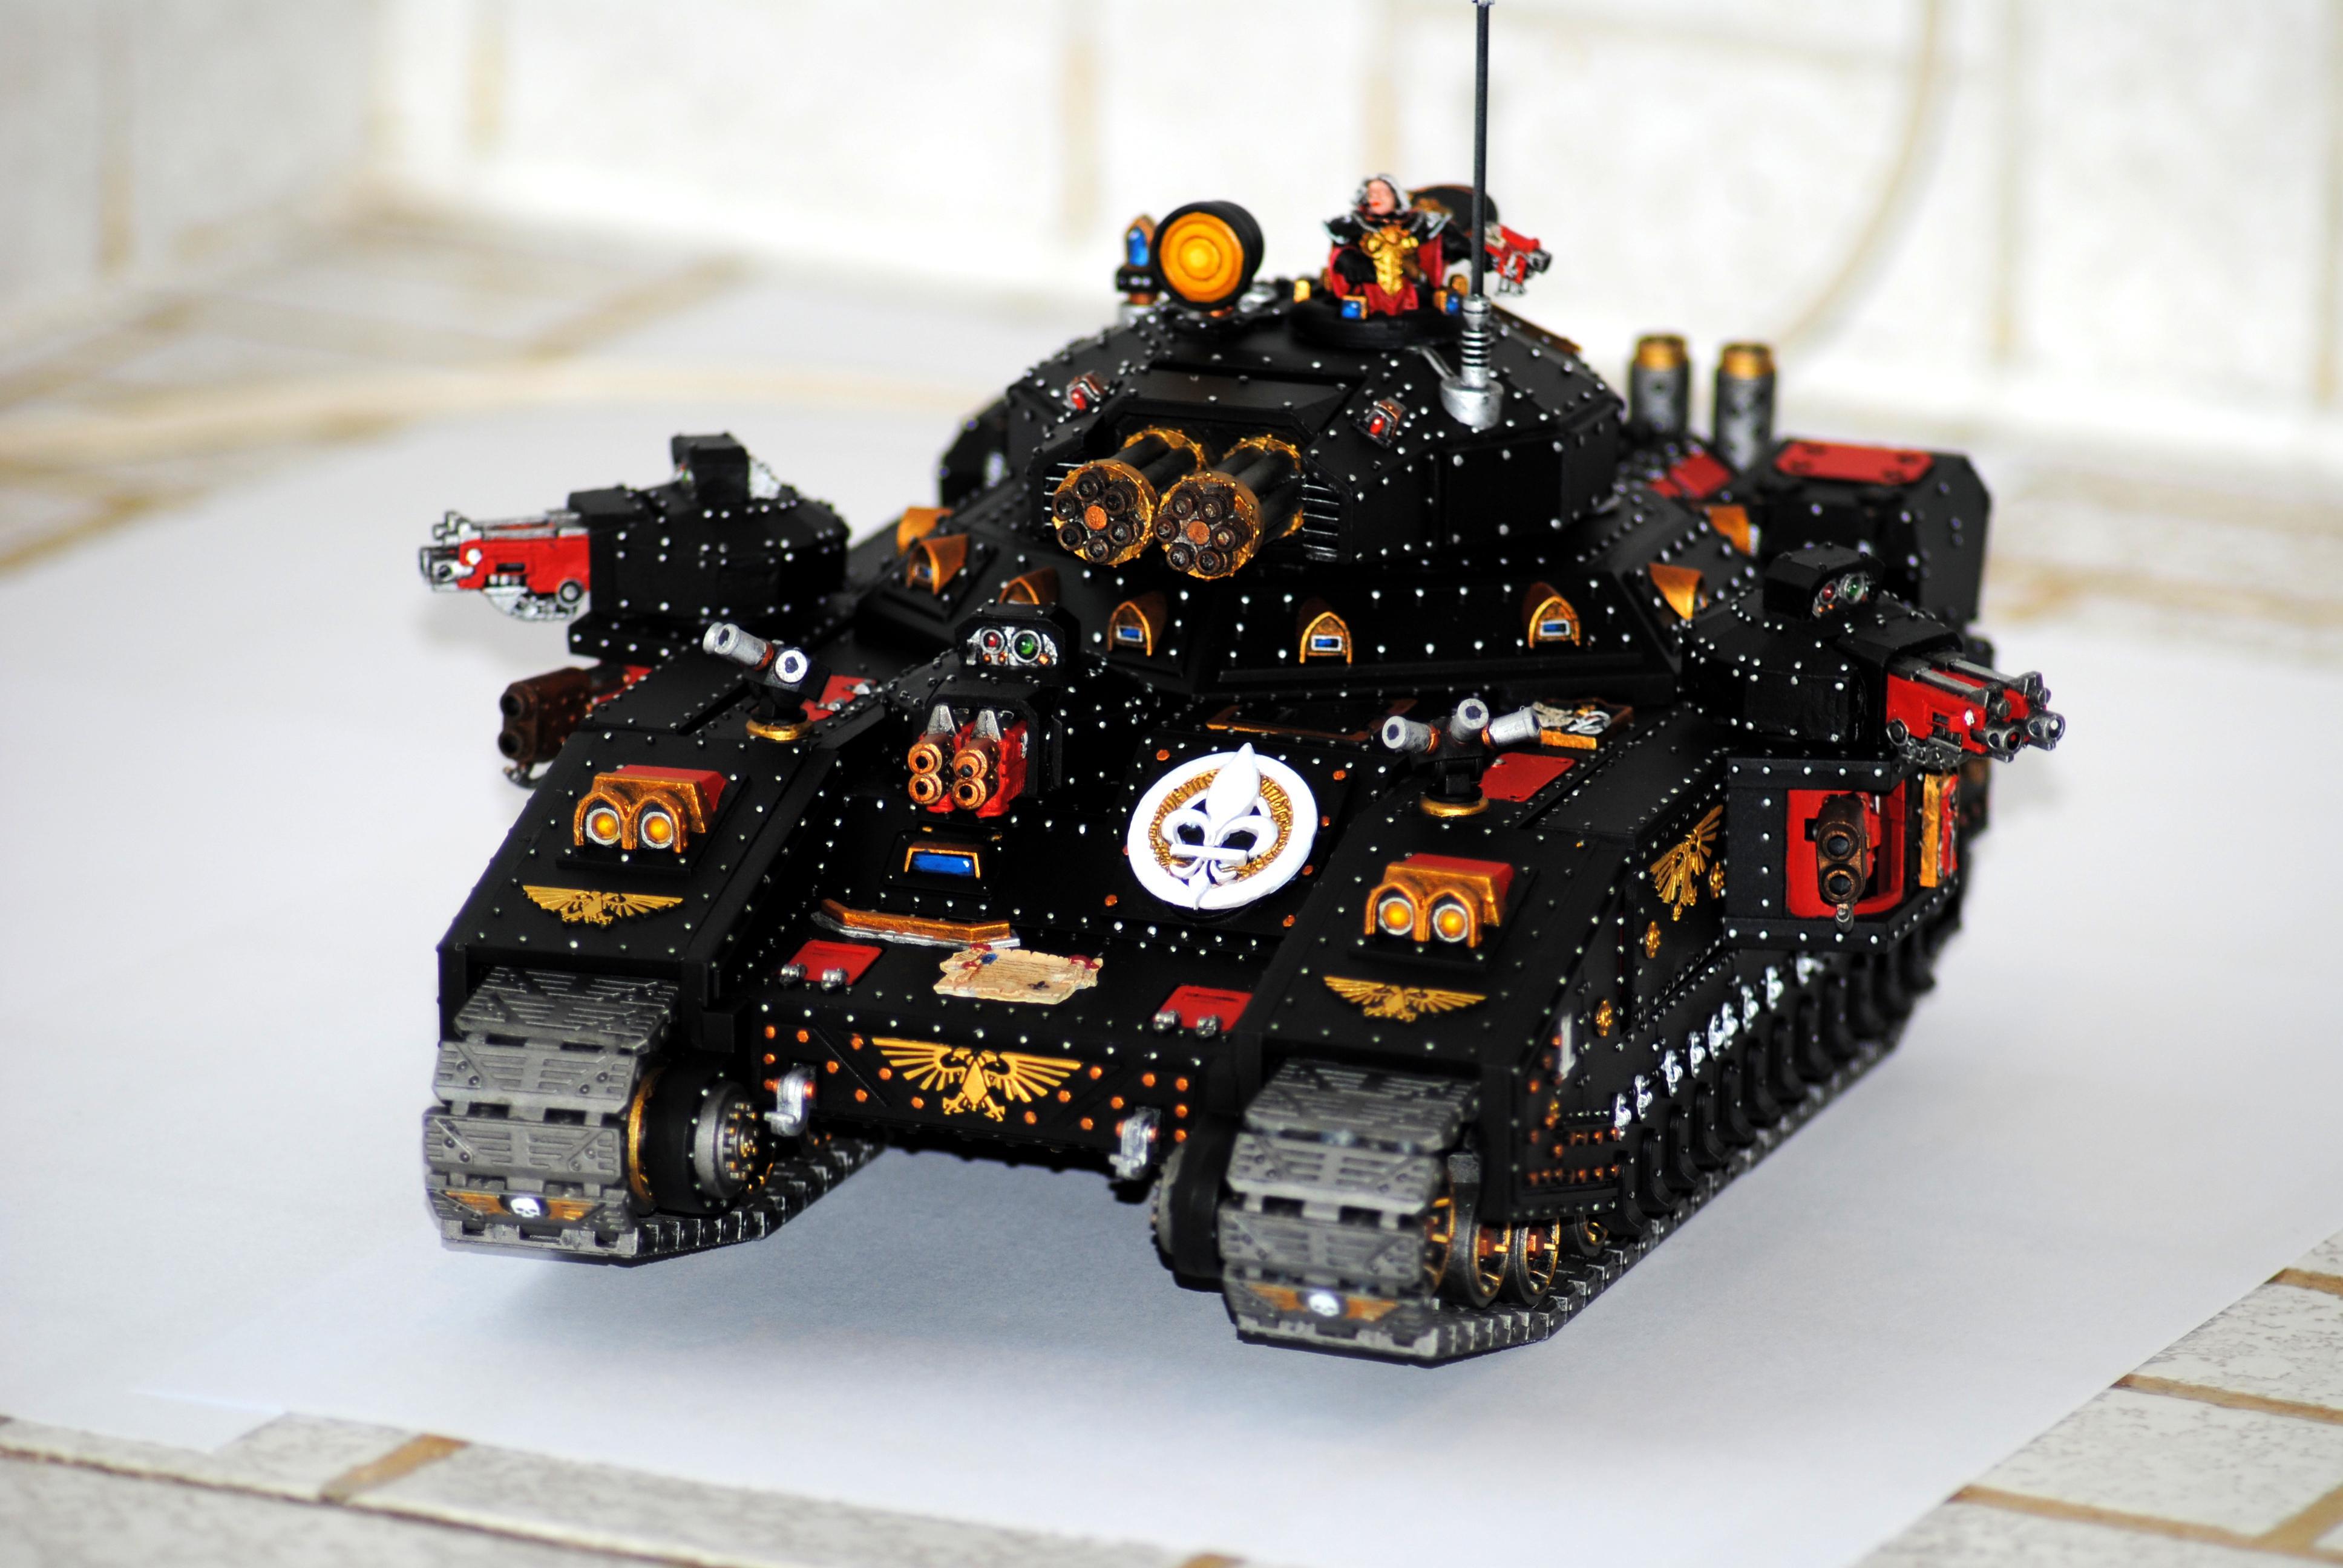 Adepta Sororitas, Baneblade, Sisters Of Battle, Superheavy Tank